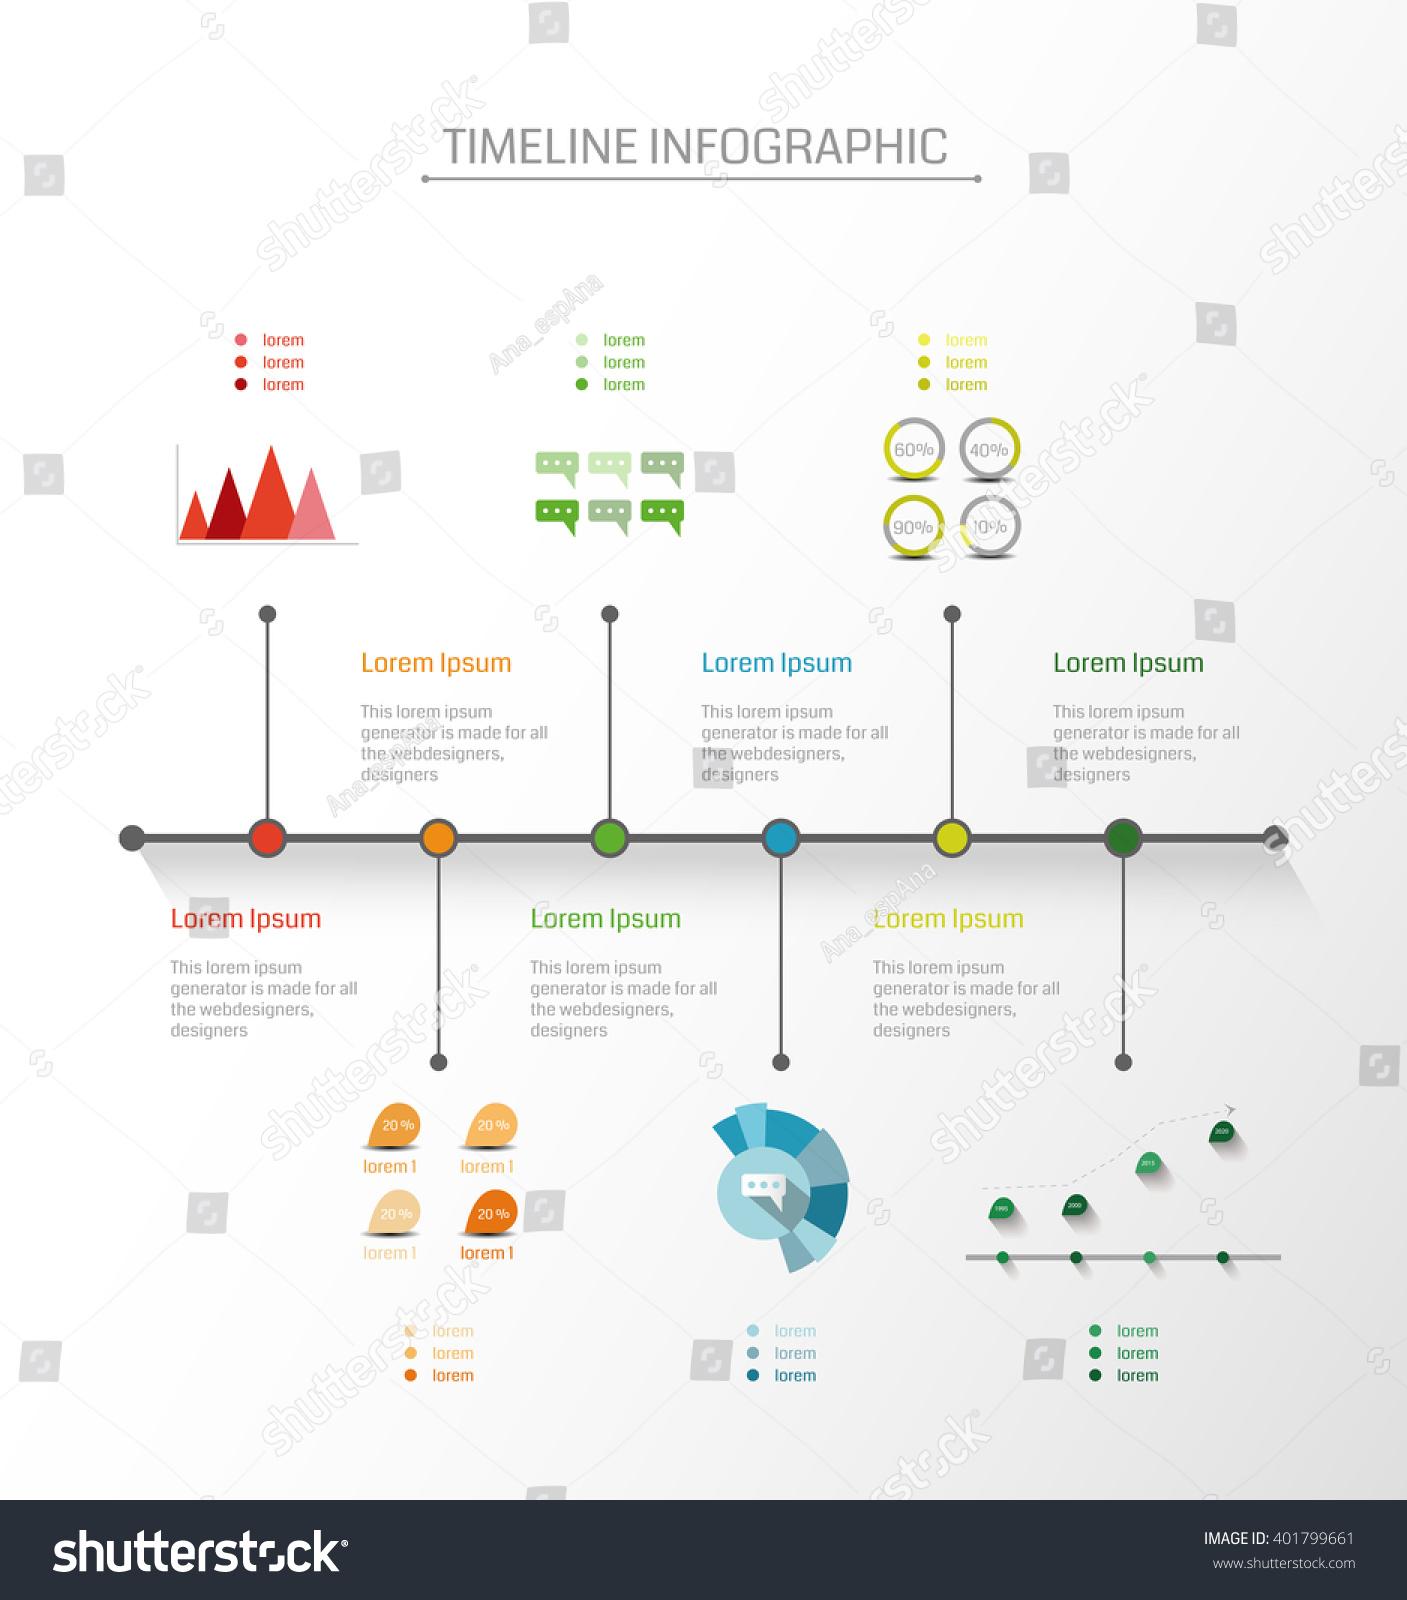 infographics vector design template timeline business stock vector 401799661 shutterstock. Black Bedroom Furniture Sets. Home Design Ideas